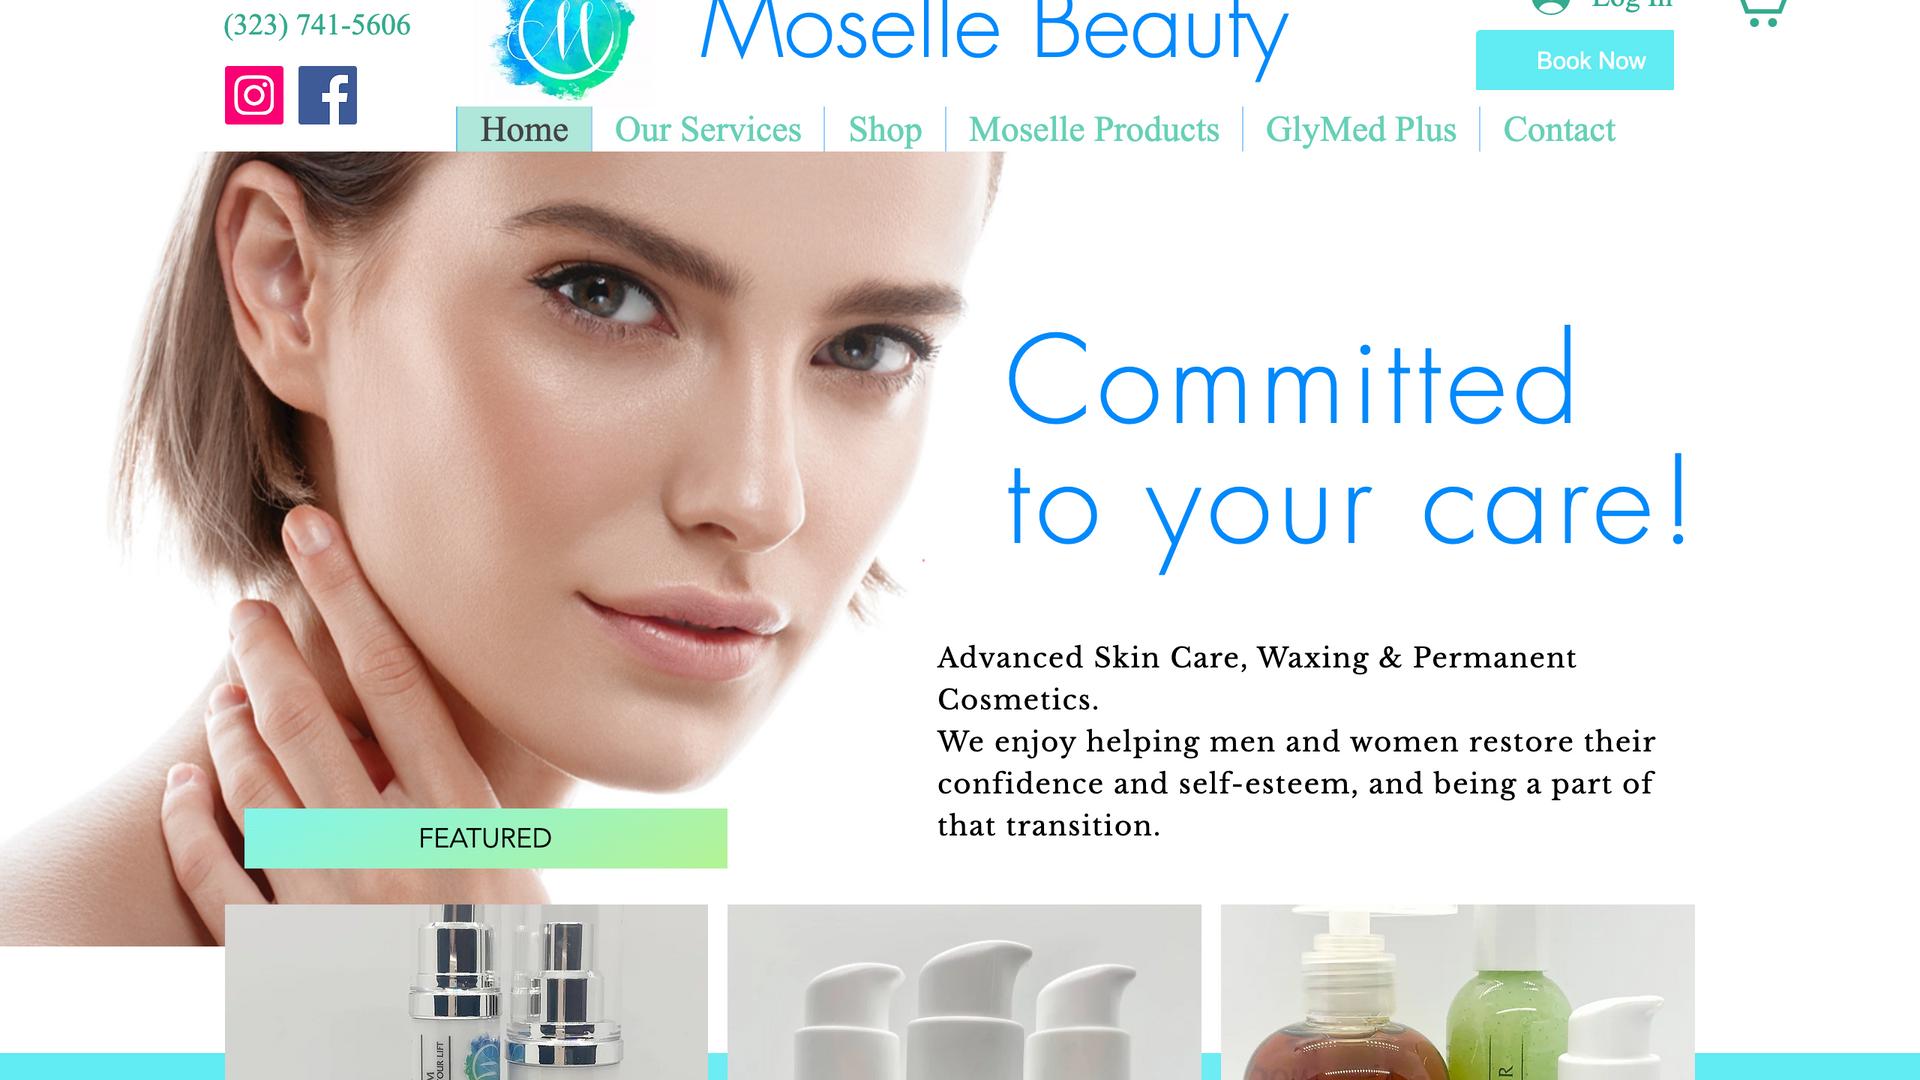 PROJECT: Mosele Beauty